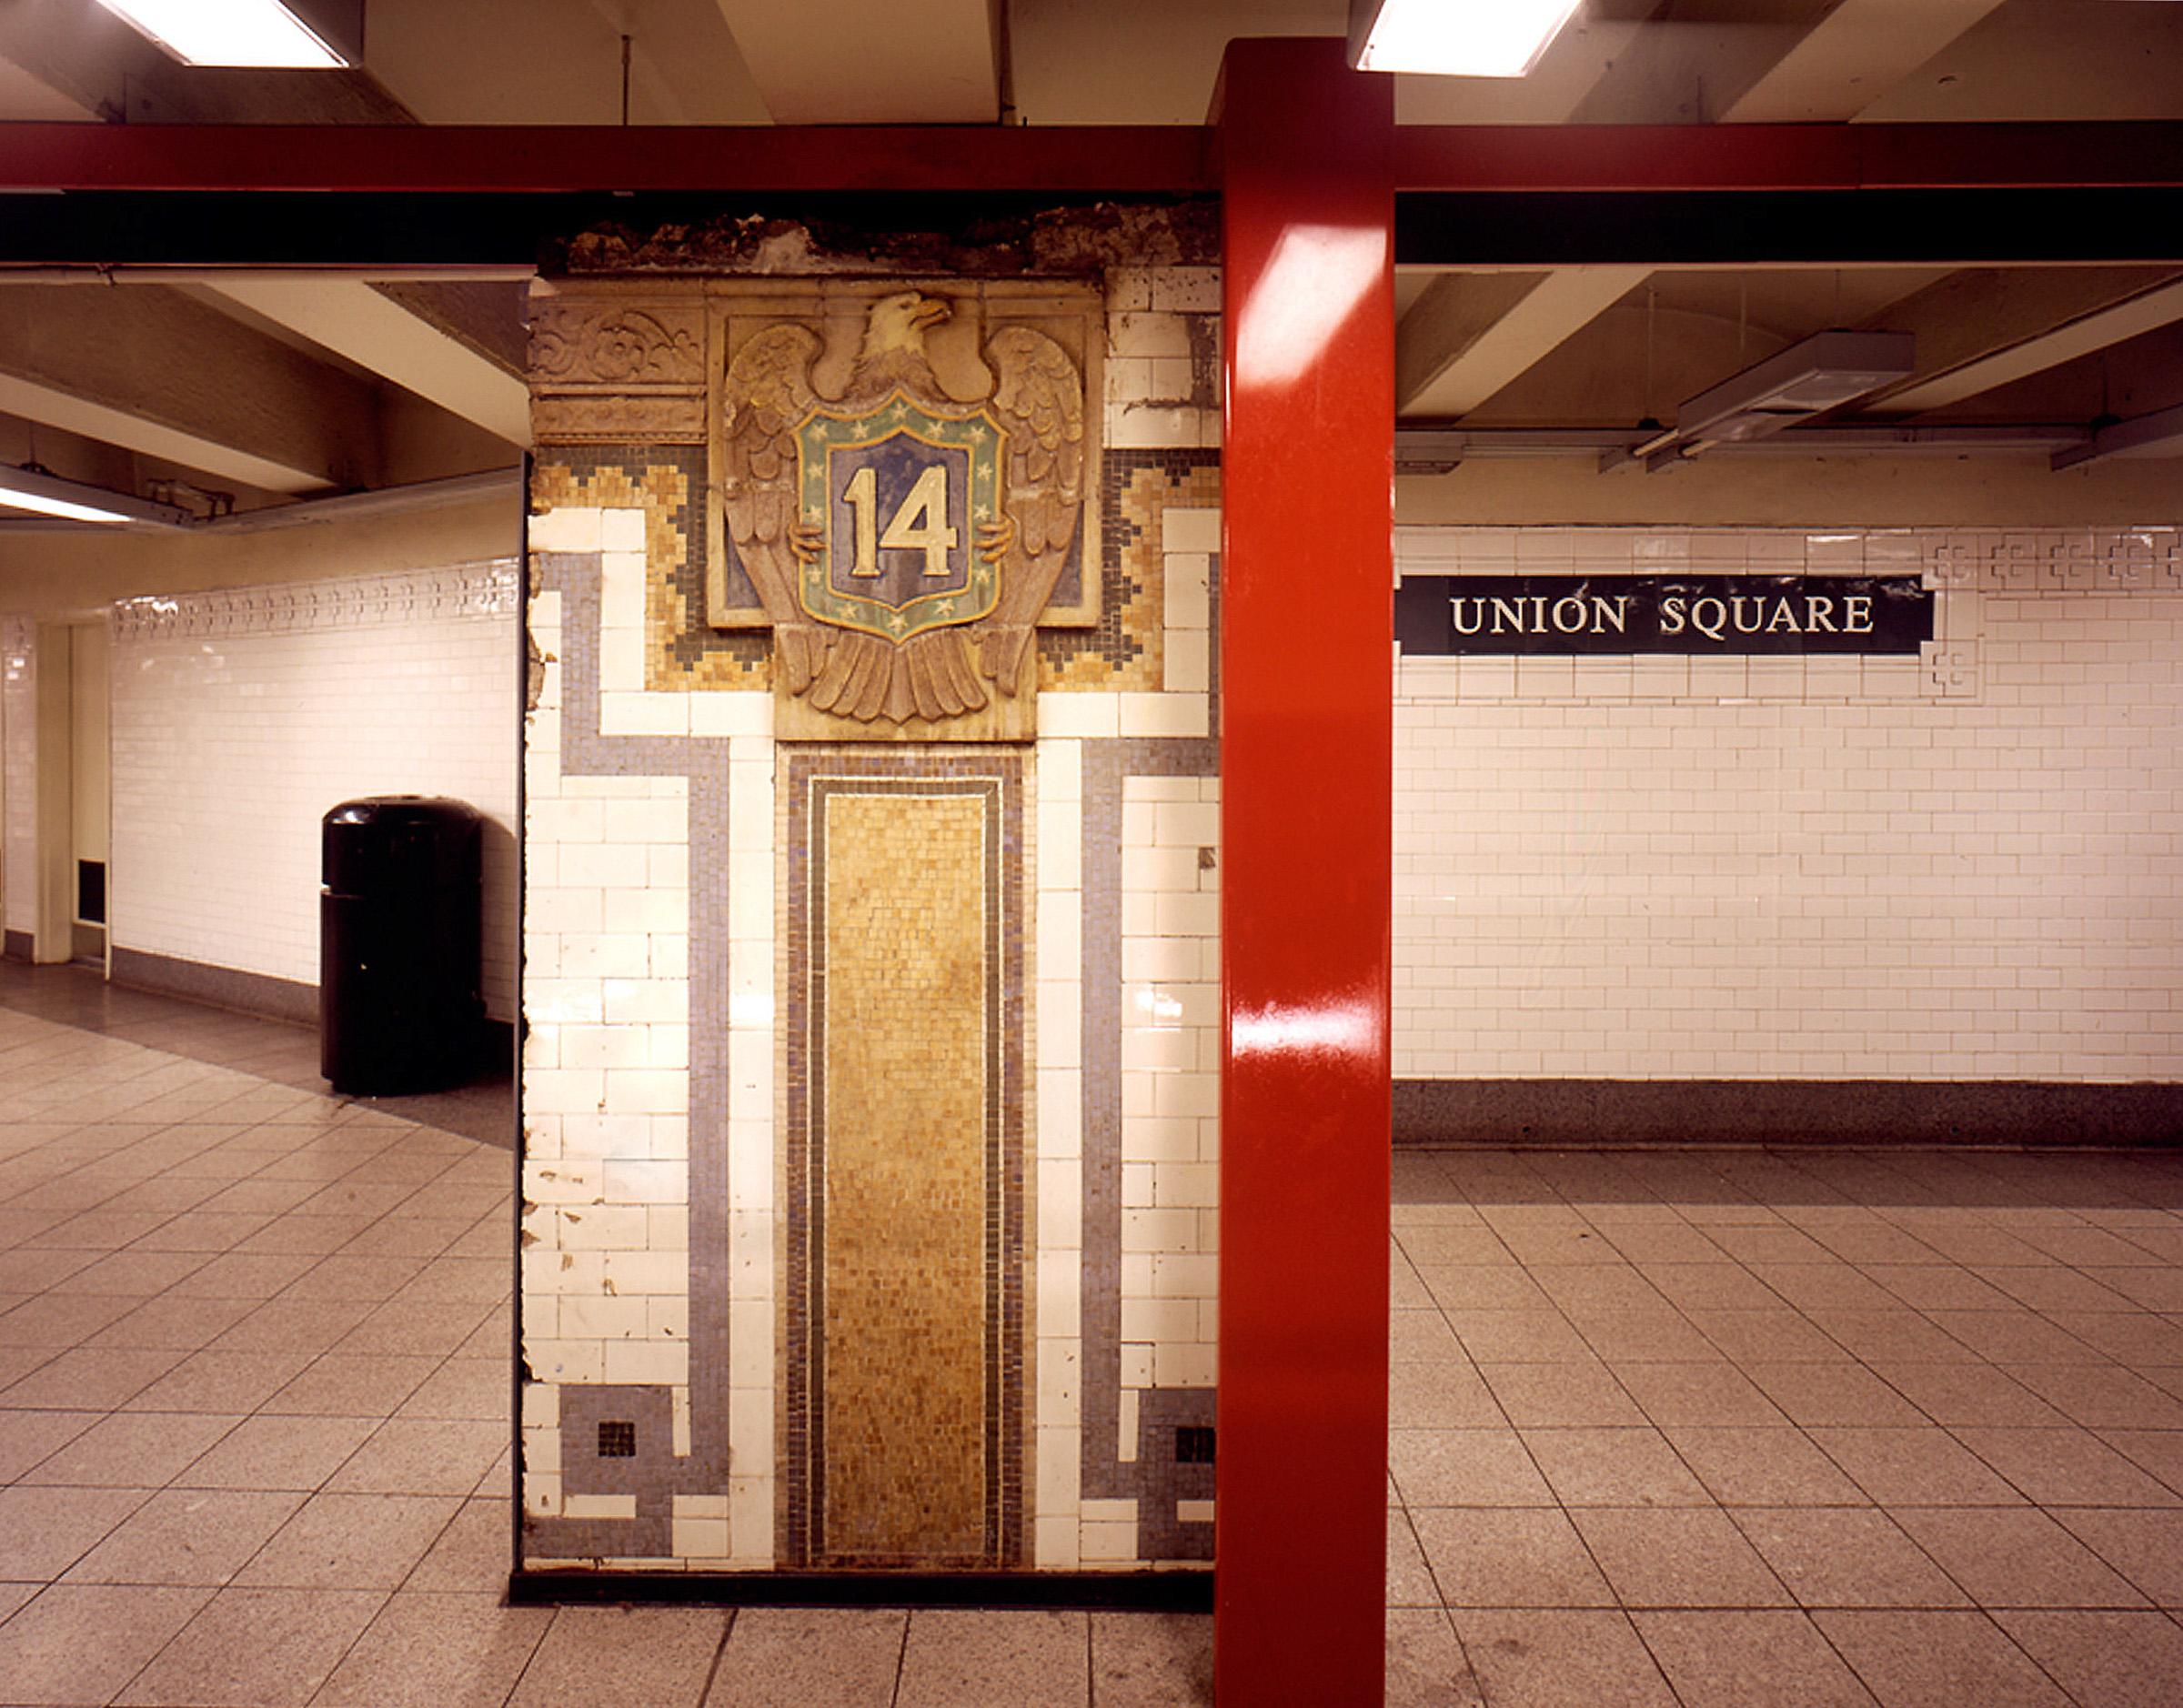 14th Street Union Square Station